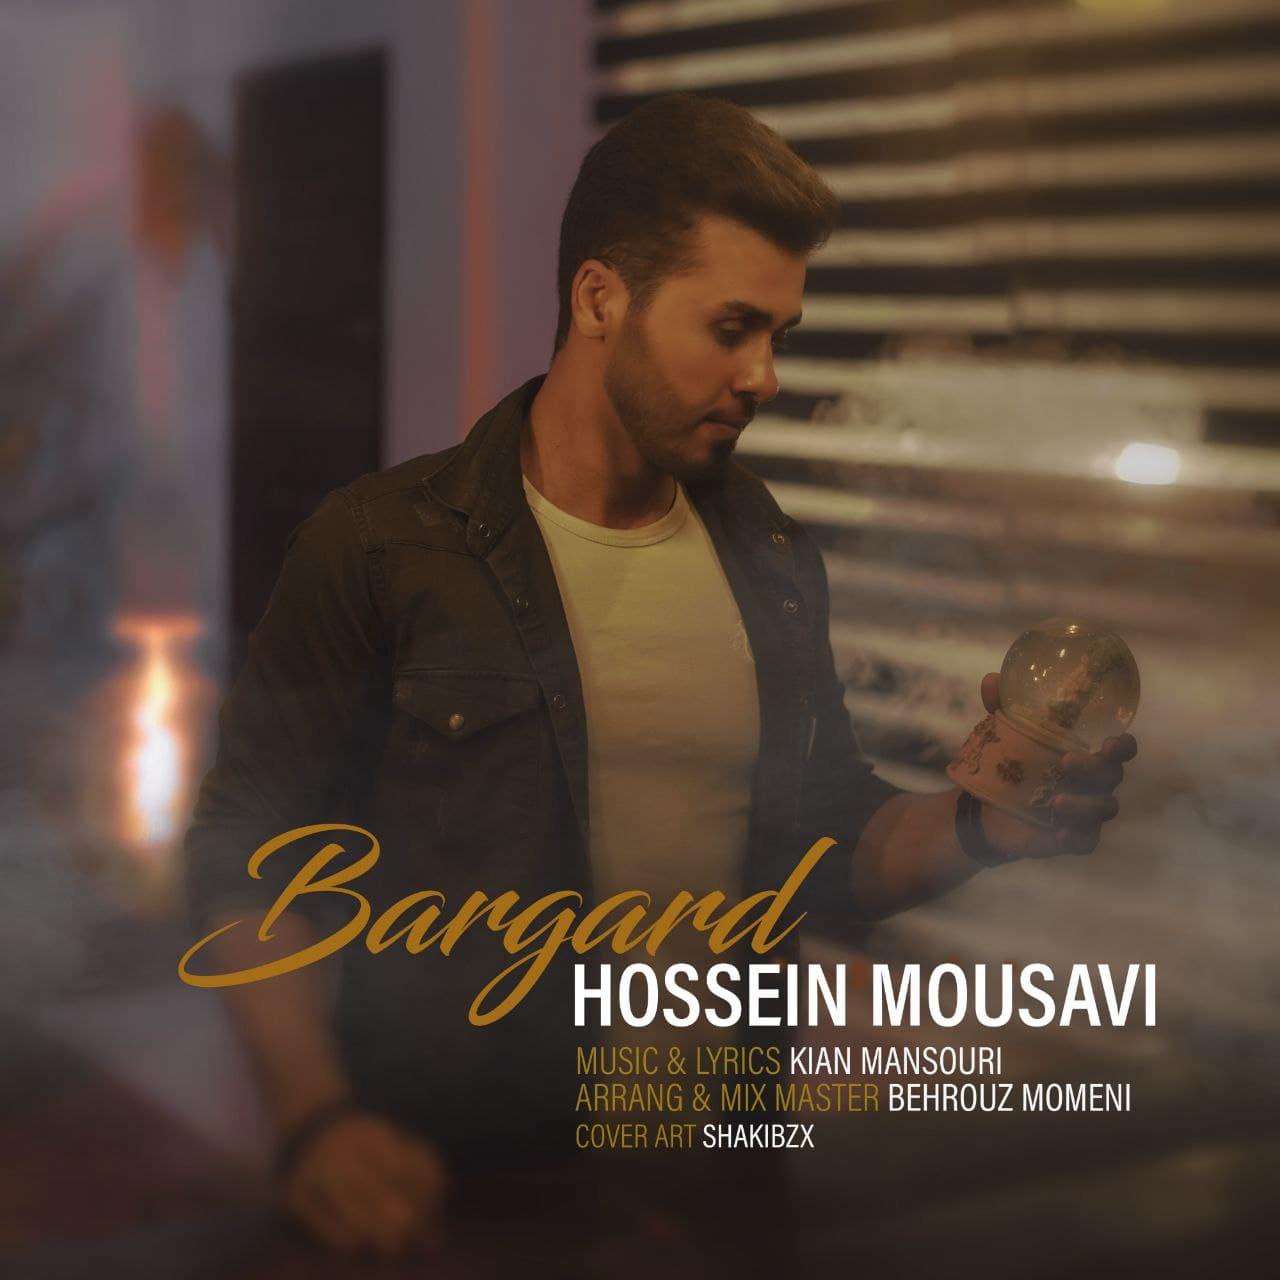 Download Ahang حسین موسوی برگرد